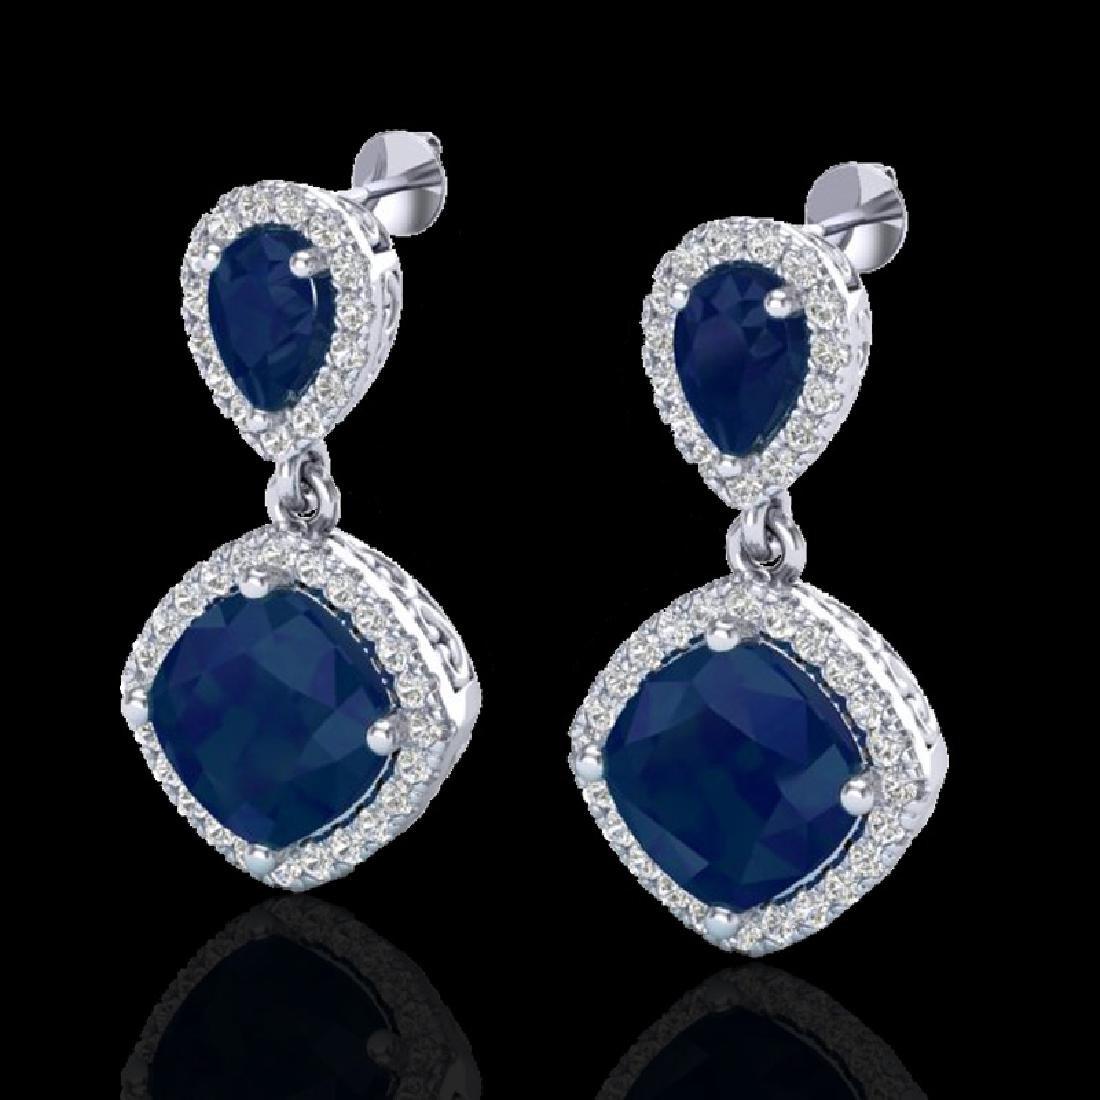 7 CTW Sapphire & Micro Pave VS/SI Diamond Earring